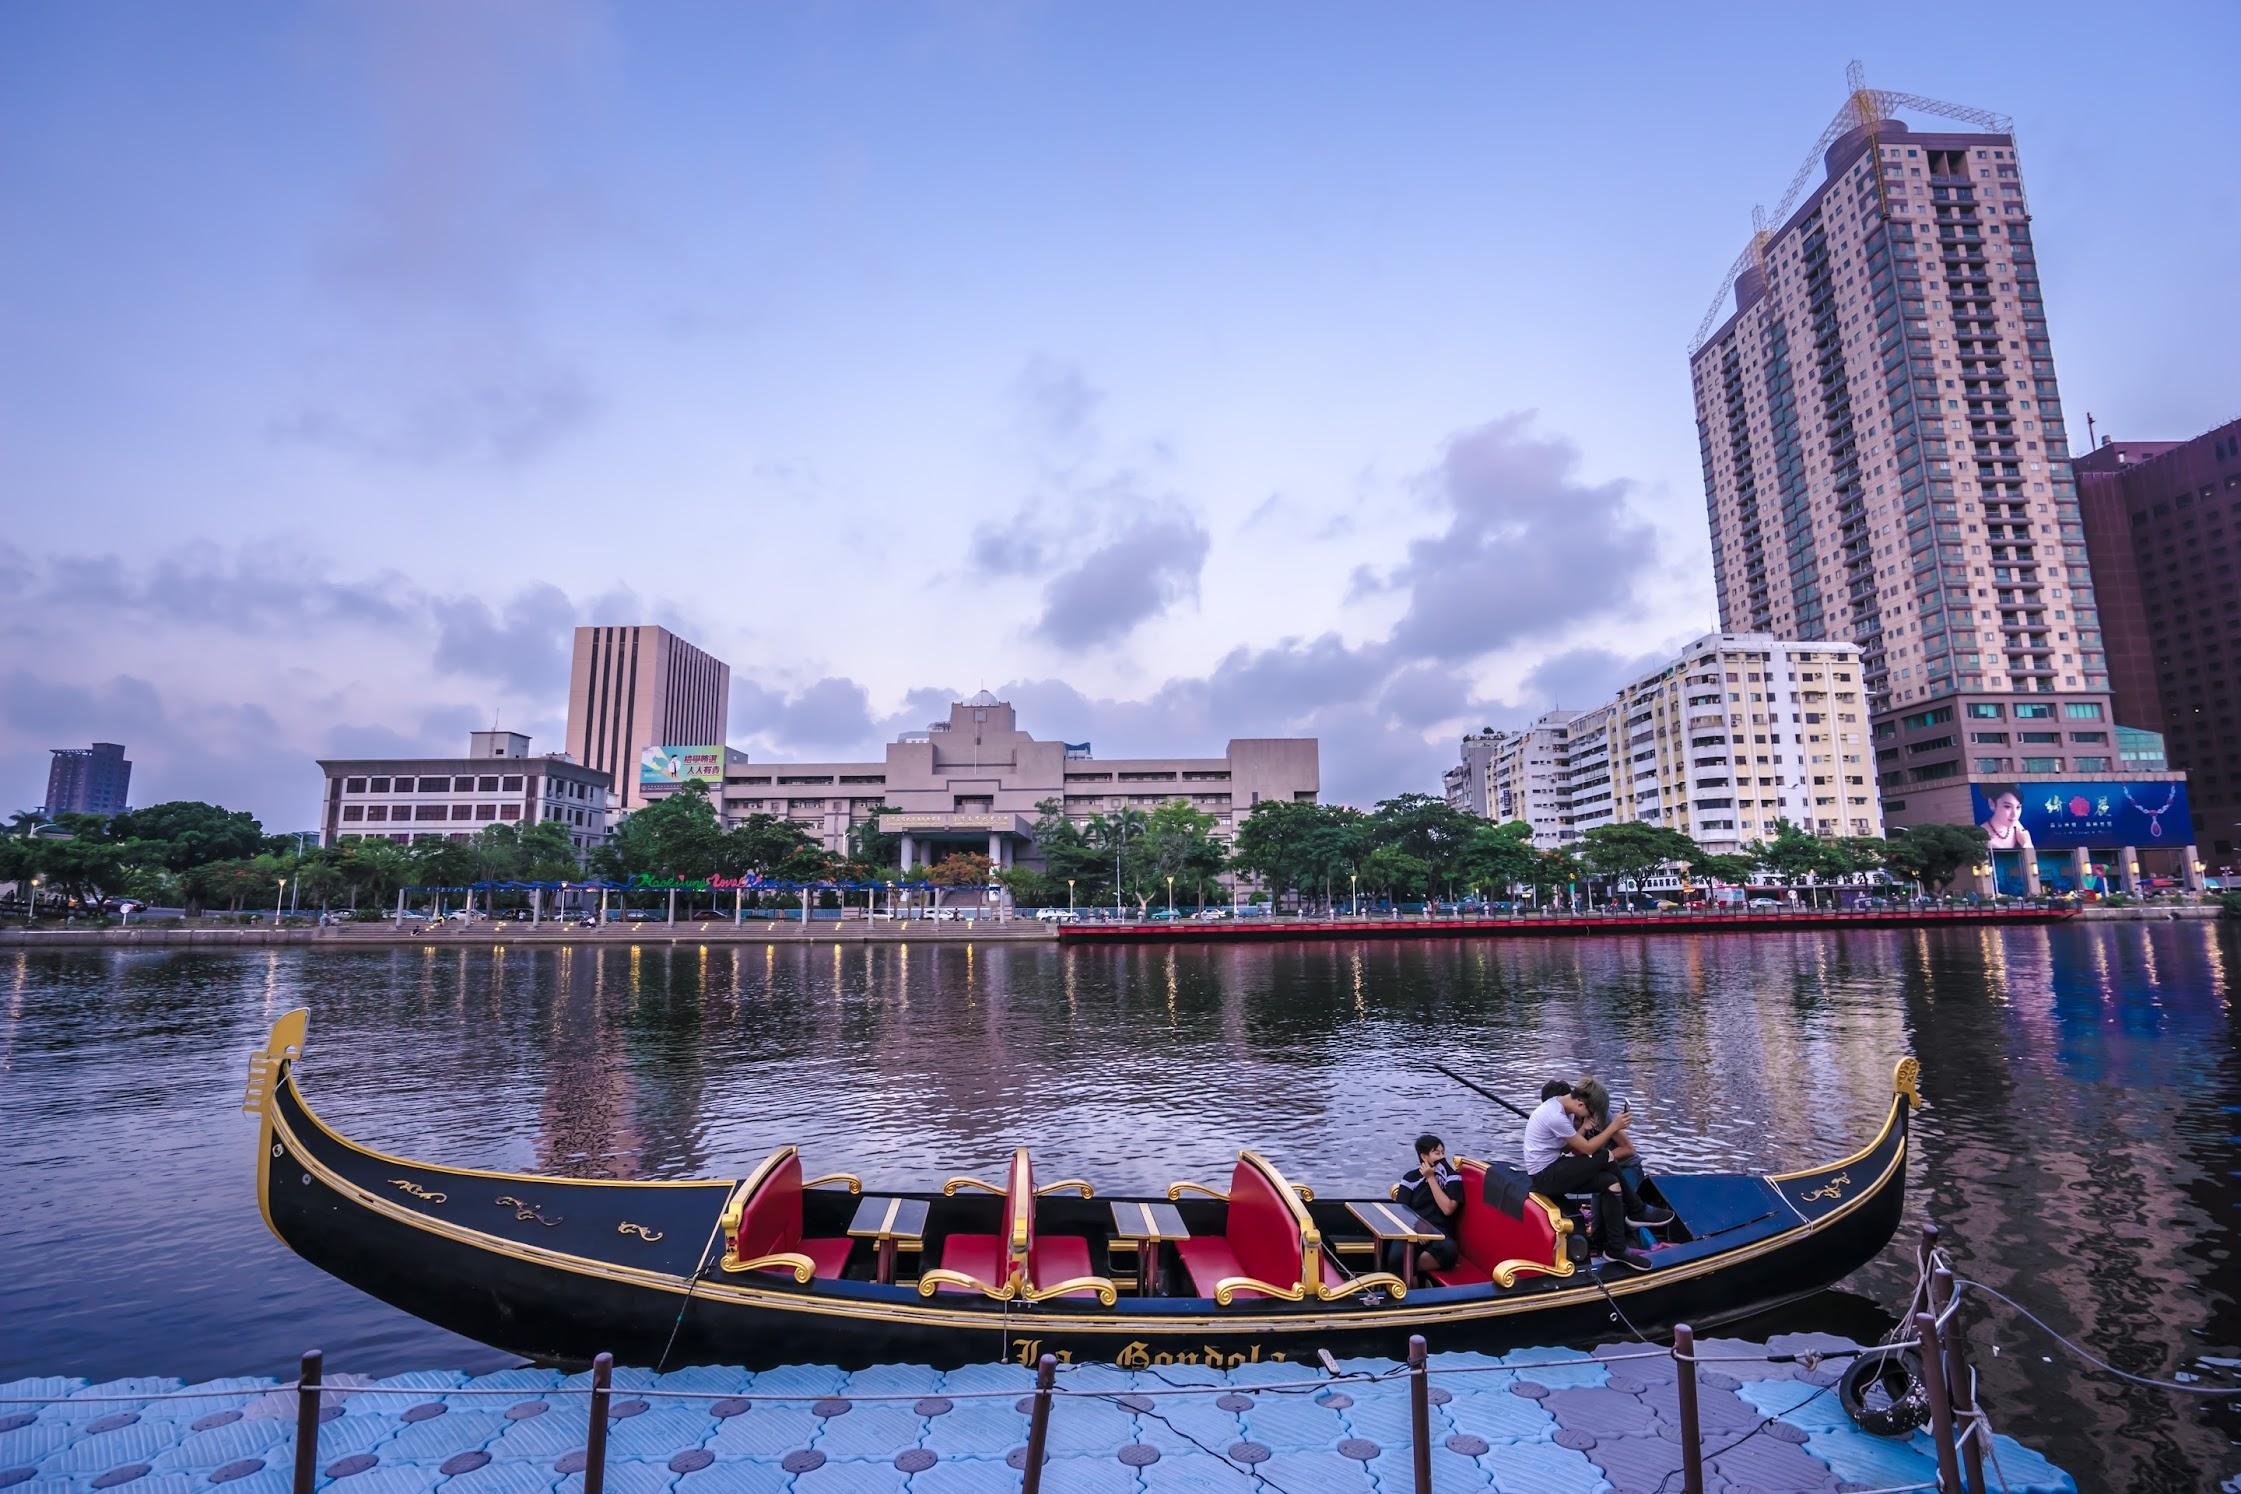 Taiwan Kaohsiung Love River Gondola